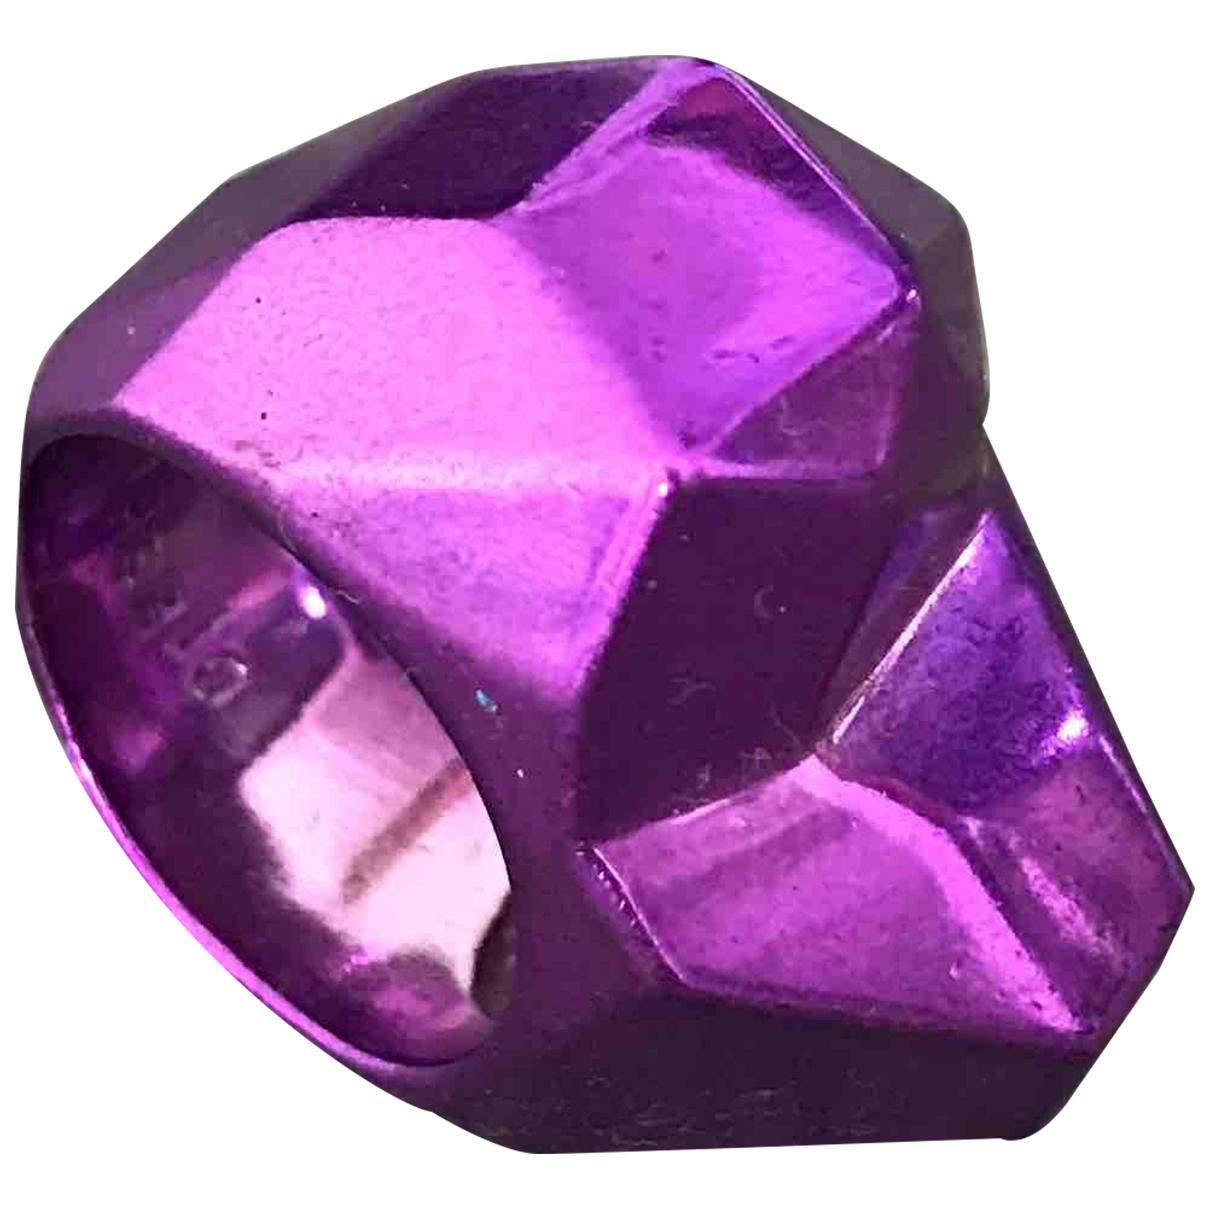 Diesel - Bague   pour femme en metal - violet